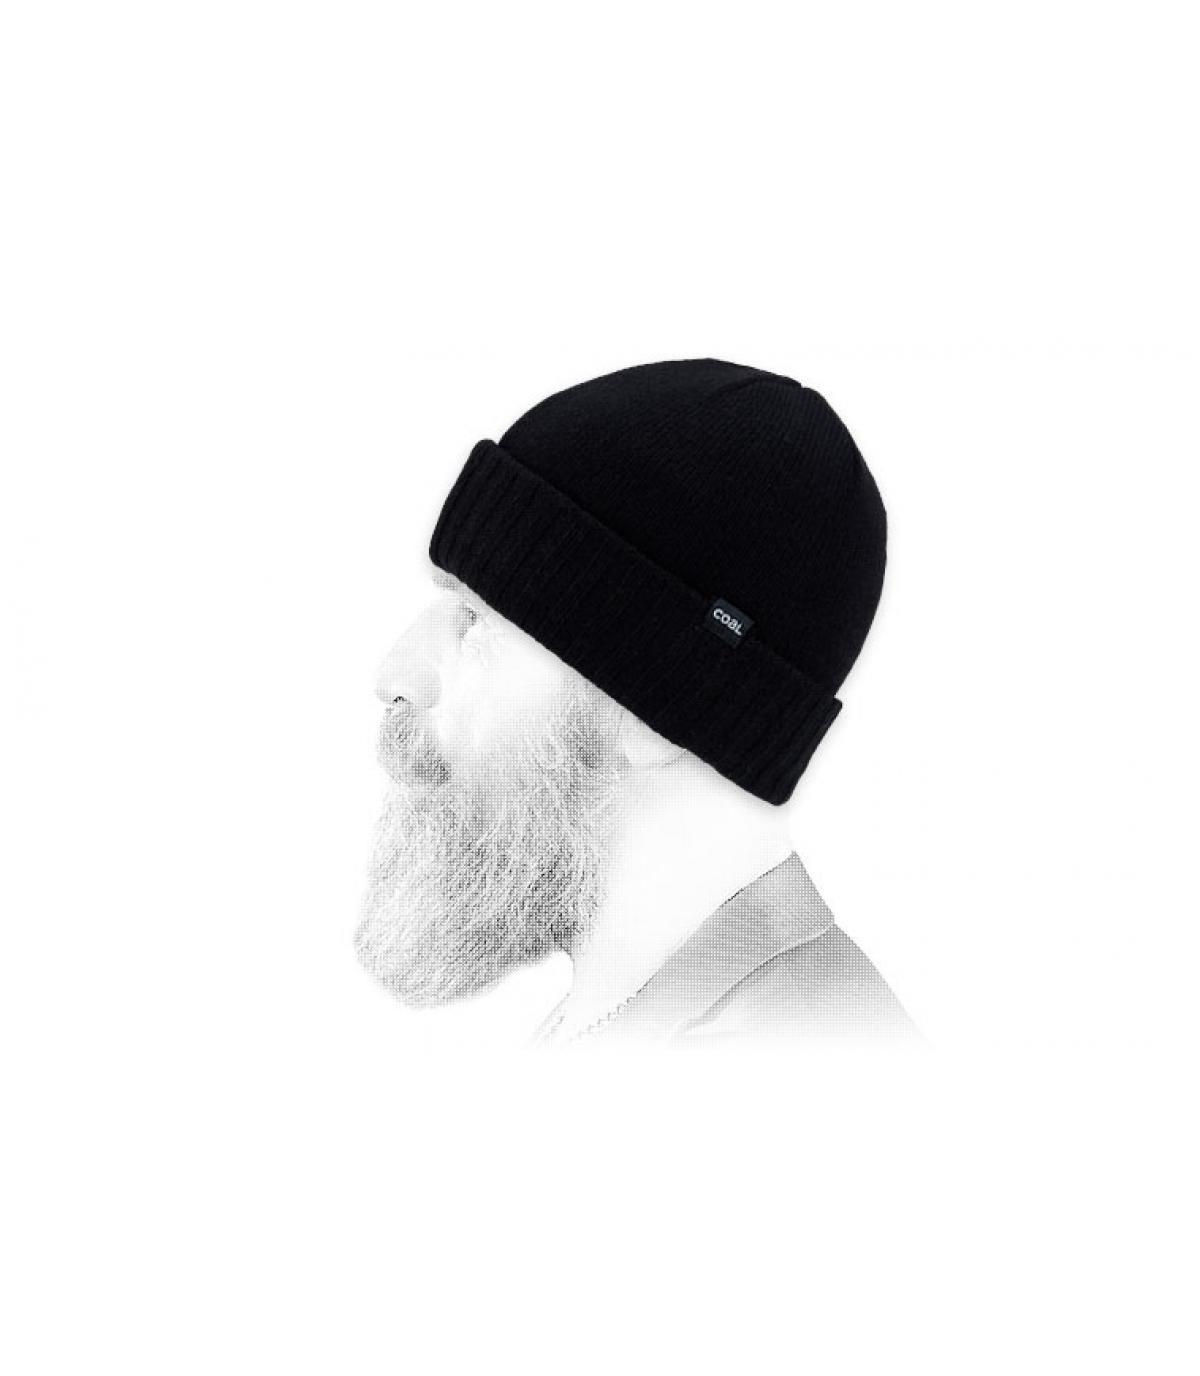 Carbone berretto di lana nera